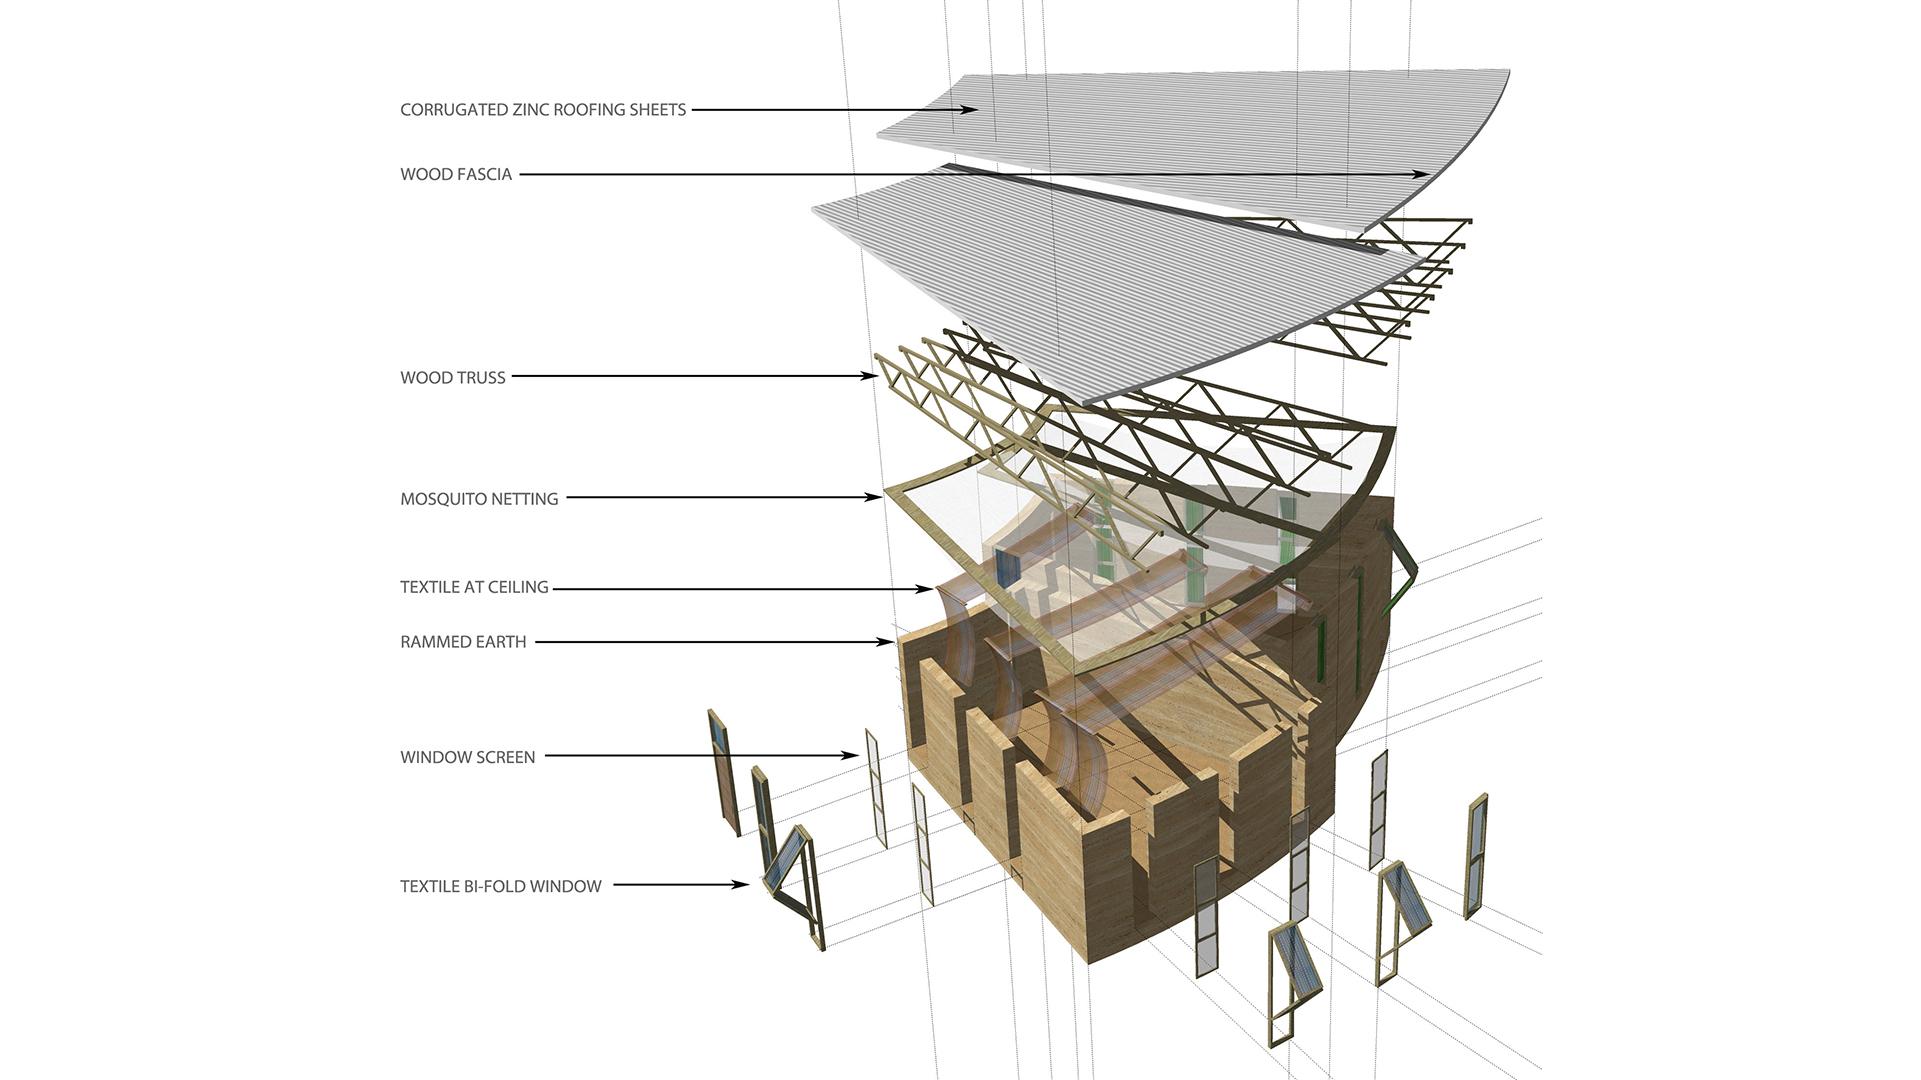 classroom axon - LABELED - 16x9.jpg